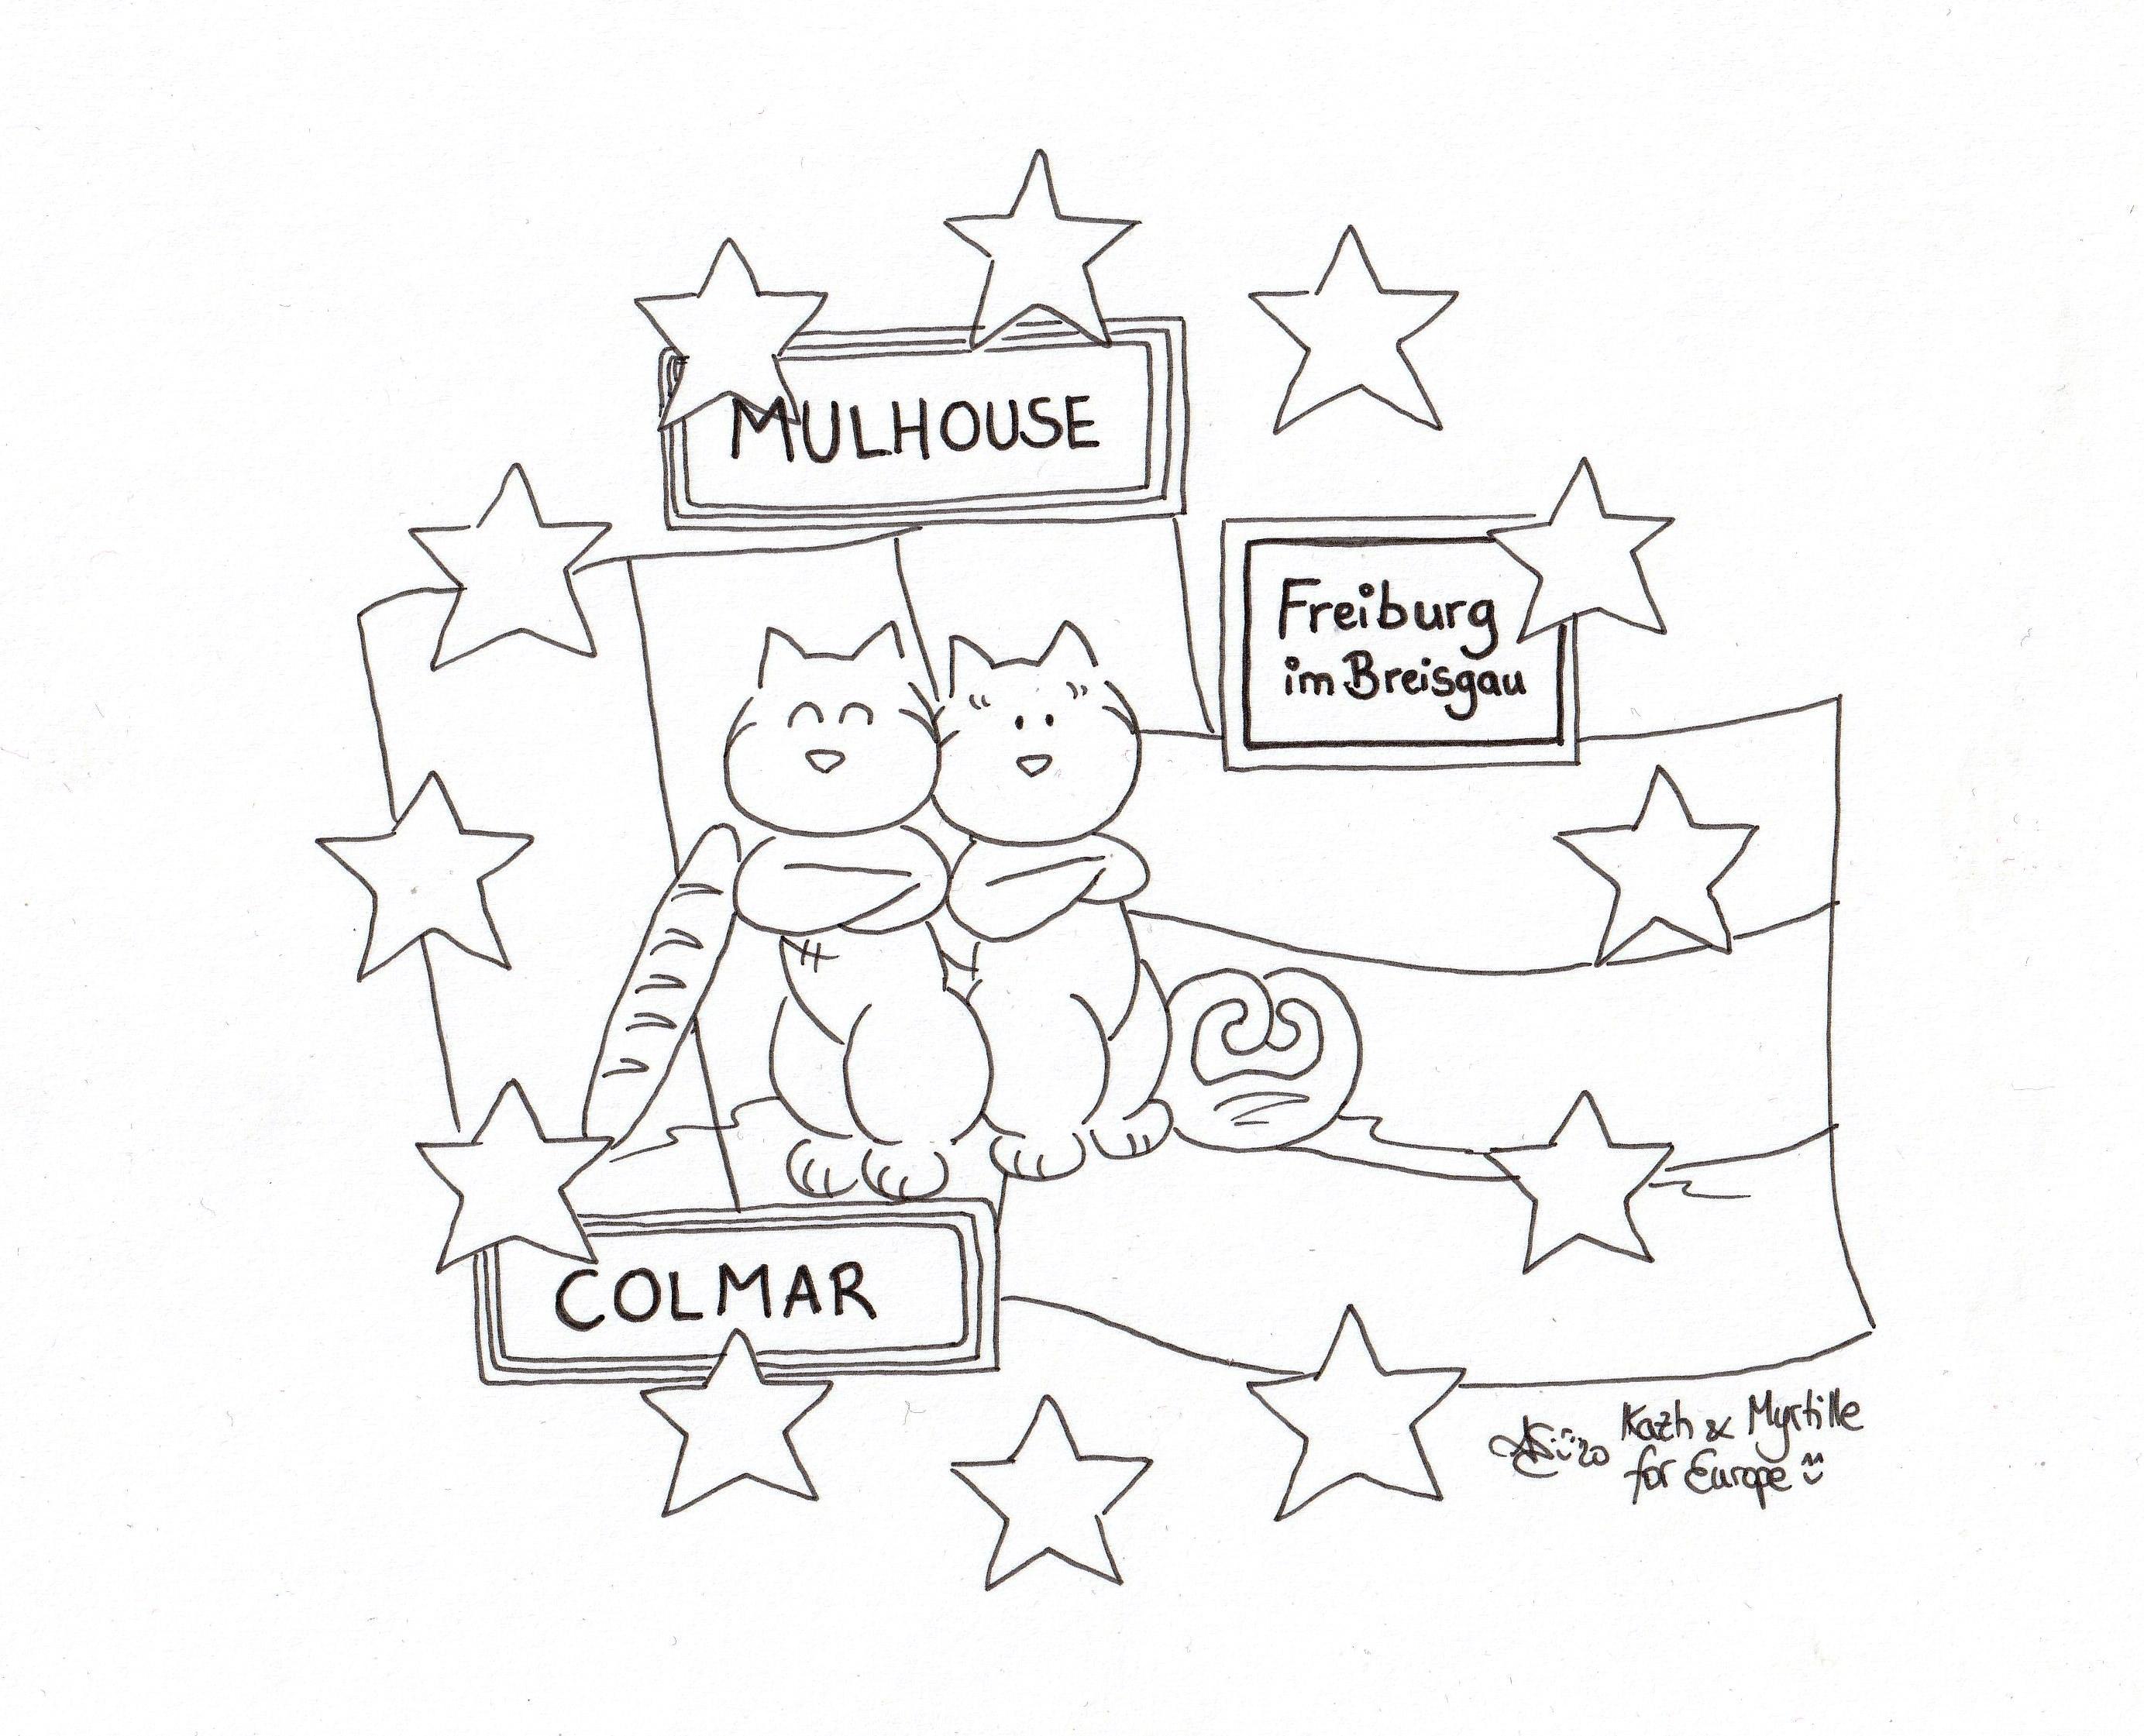 Franco-allemand Colmar-Freiburg-Mulhouse coloriage